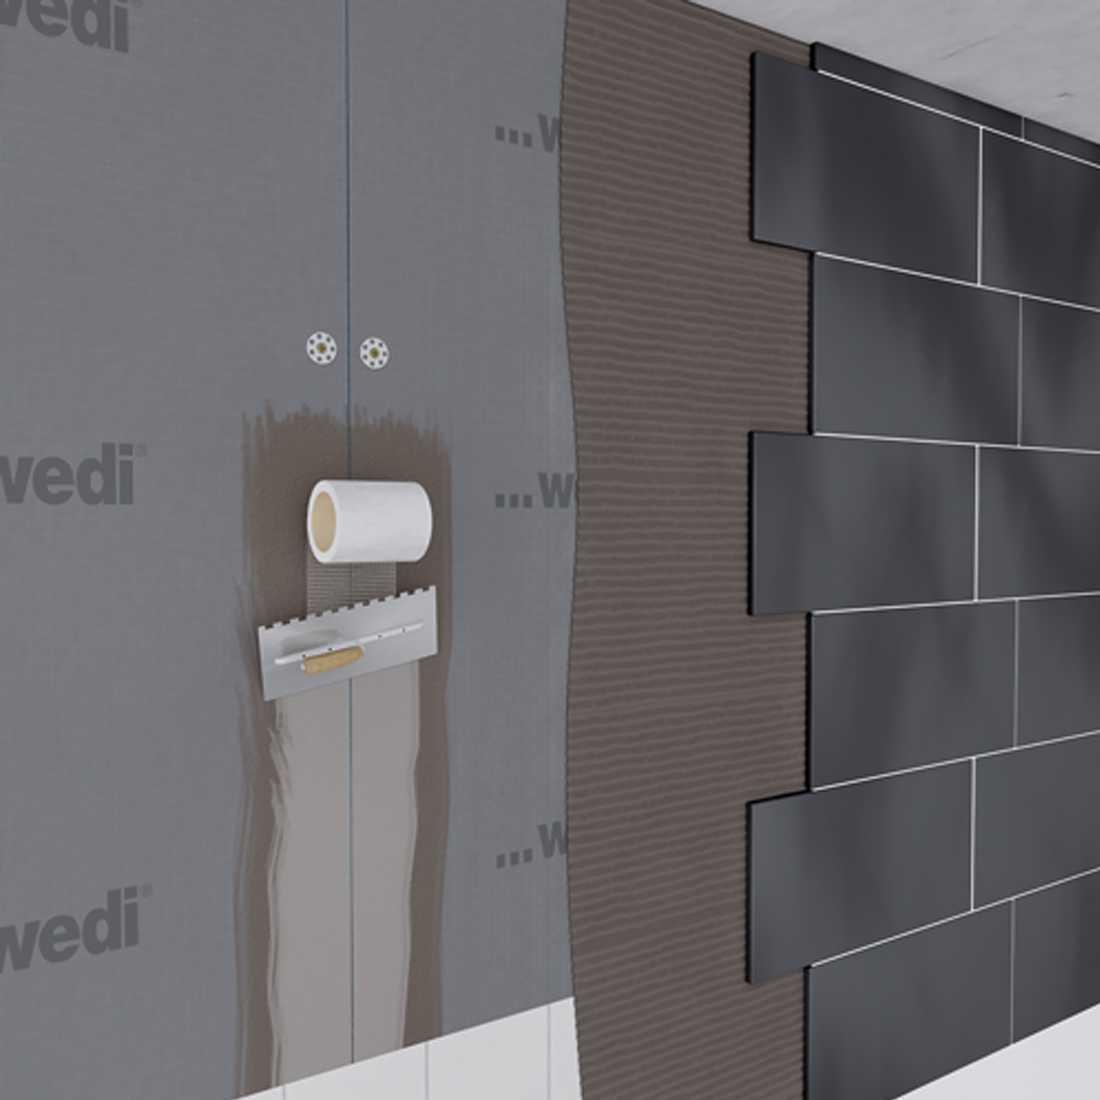 wedi 320 universell einsetzbarer fliesenkleber. Black Bedroom Furniture Sets. Home Design Ideas